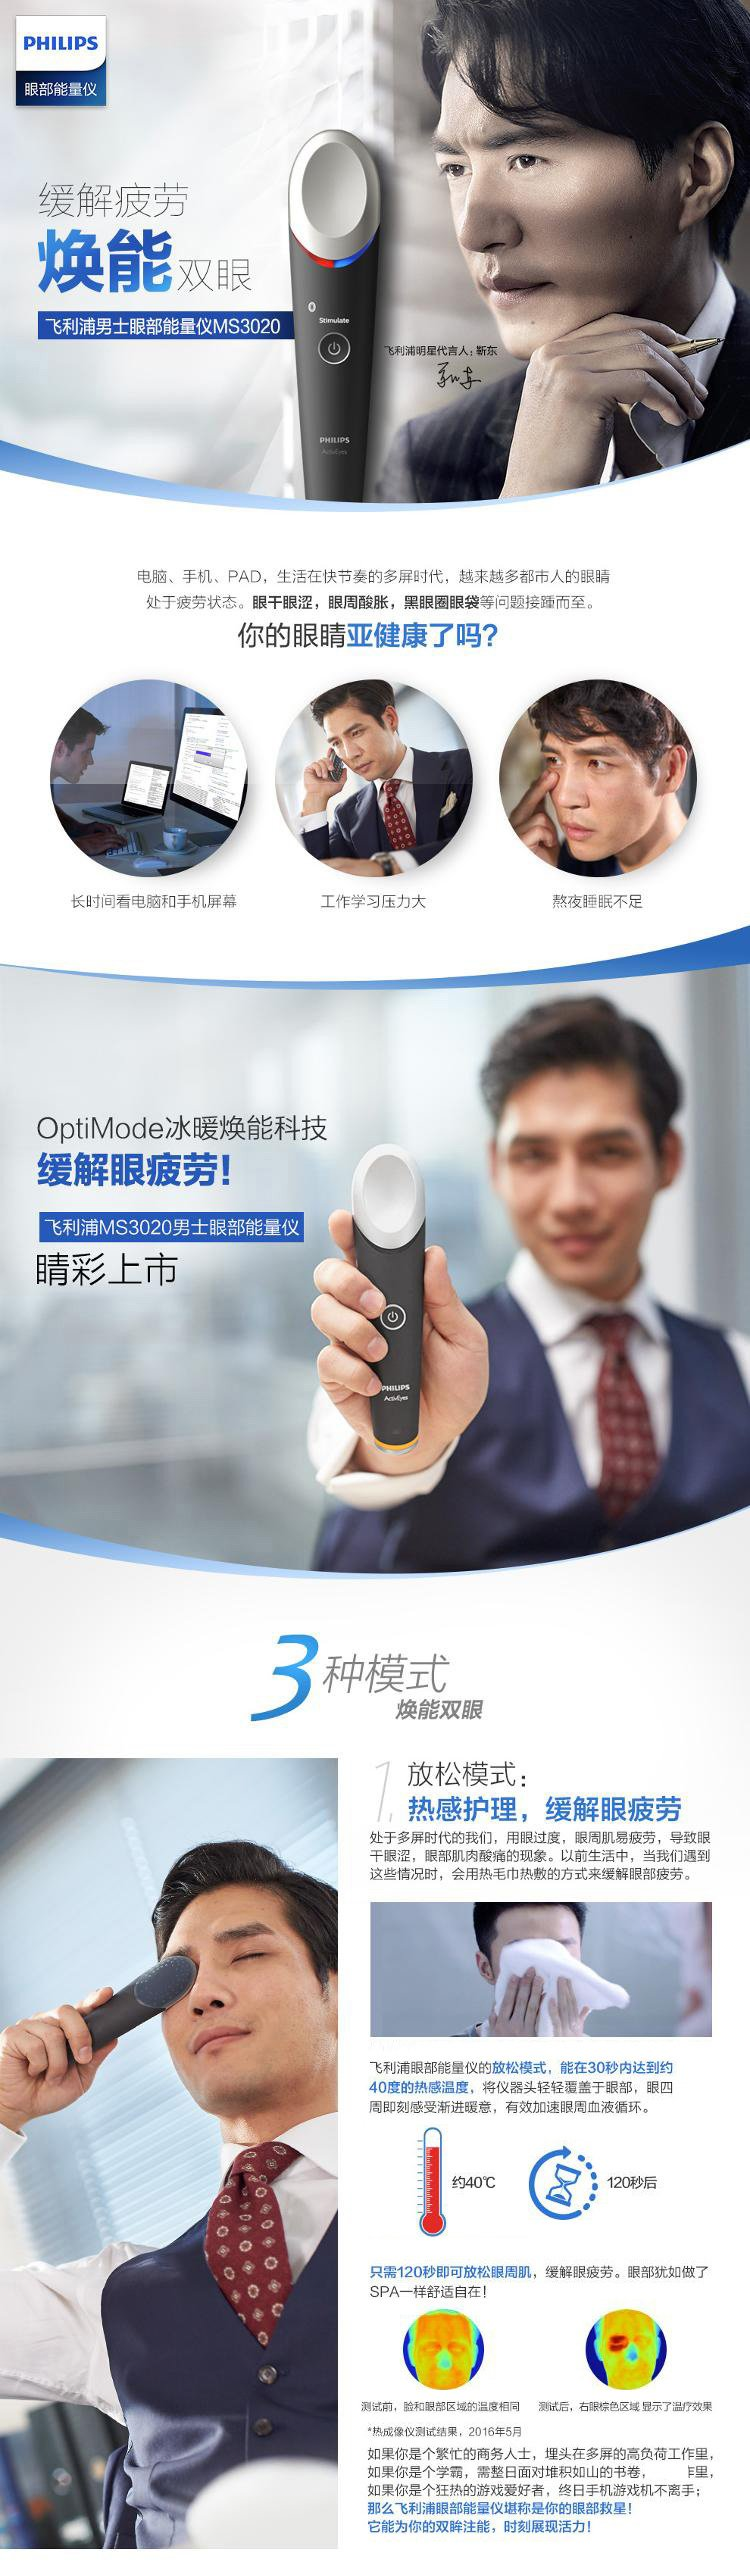 Philips 飞利浦 眼部能量仪MS3020/10